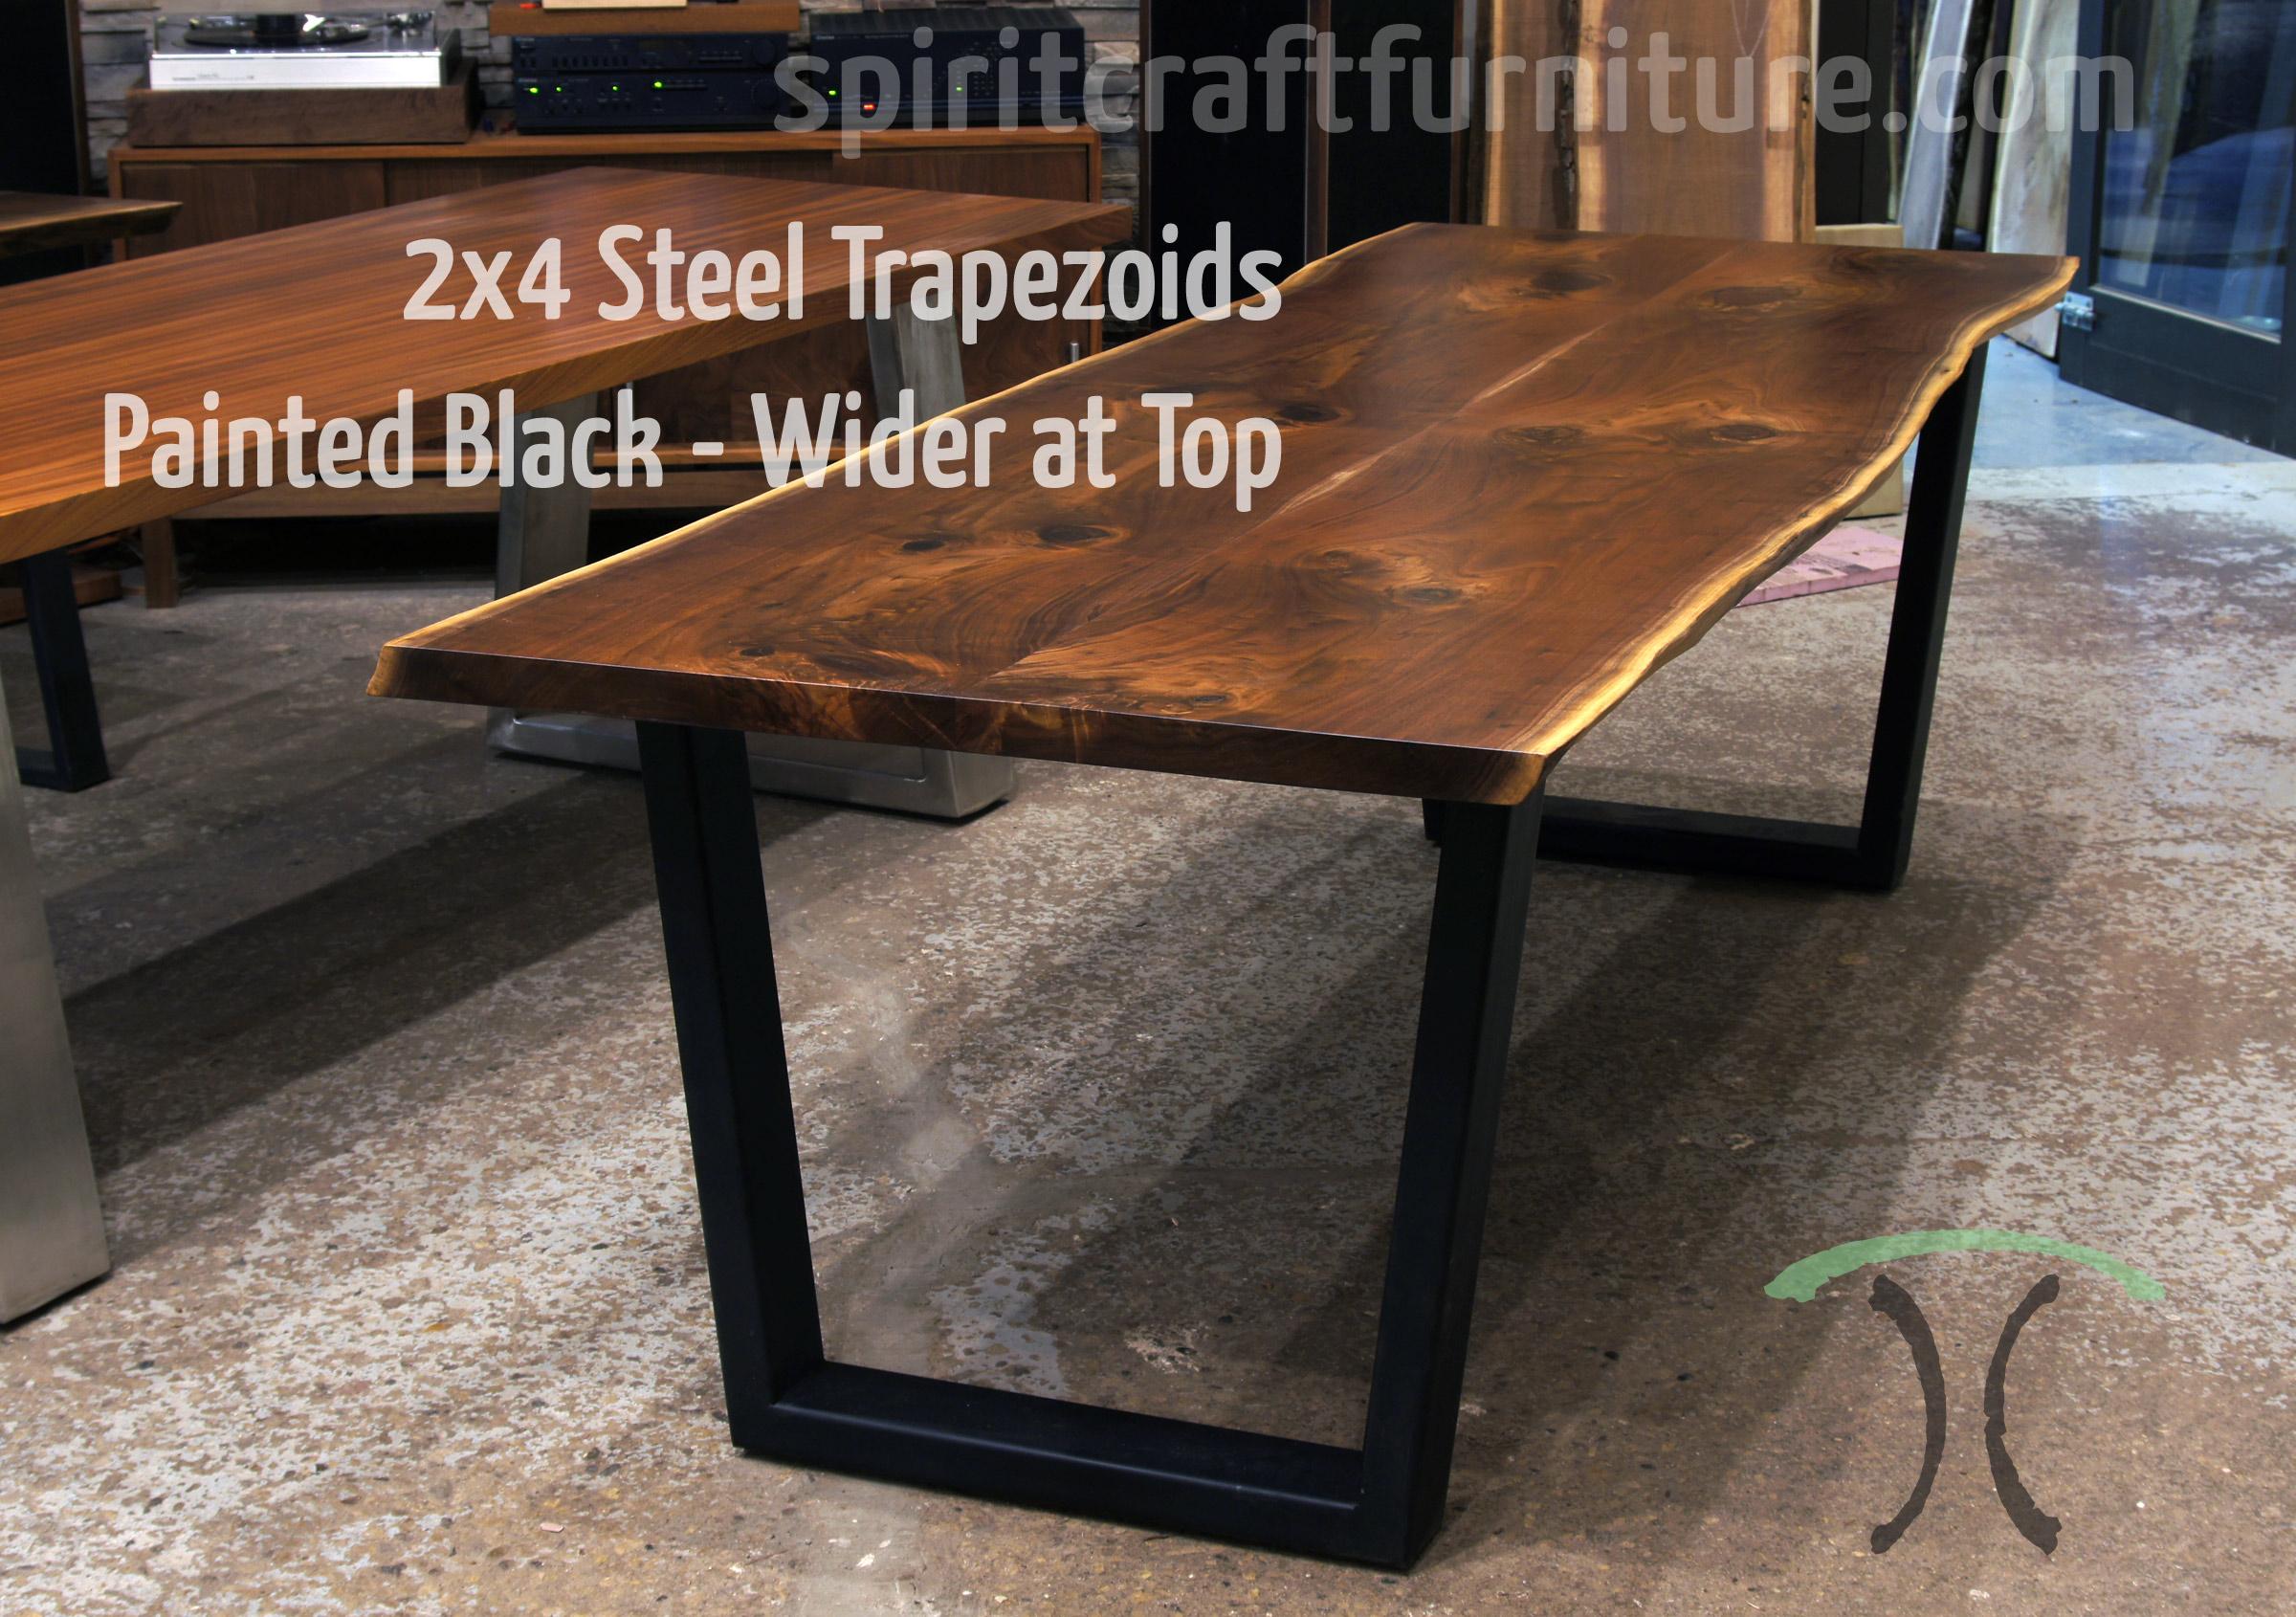 Teal Bases Custom Made X Steel Trapezoid Painted Black On Live Edge Ash Table Table Legs Hardwood Slab Table S Steel Table Legs Perth Steel Table Legs Brisbane houzz-02 Steel Table Legs